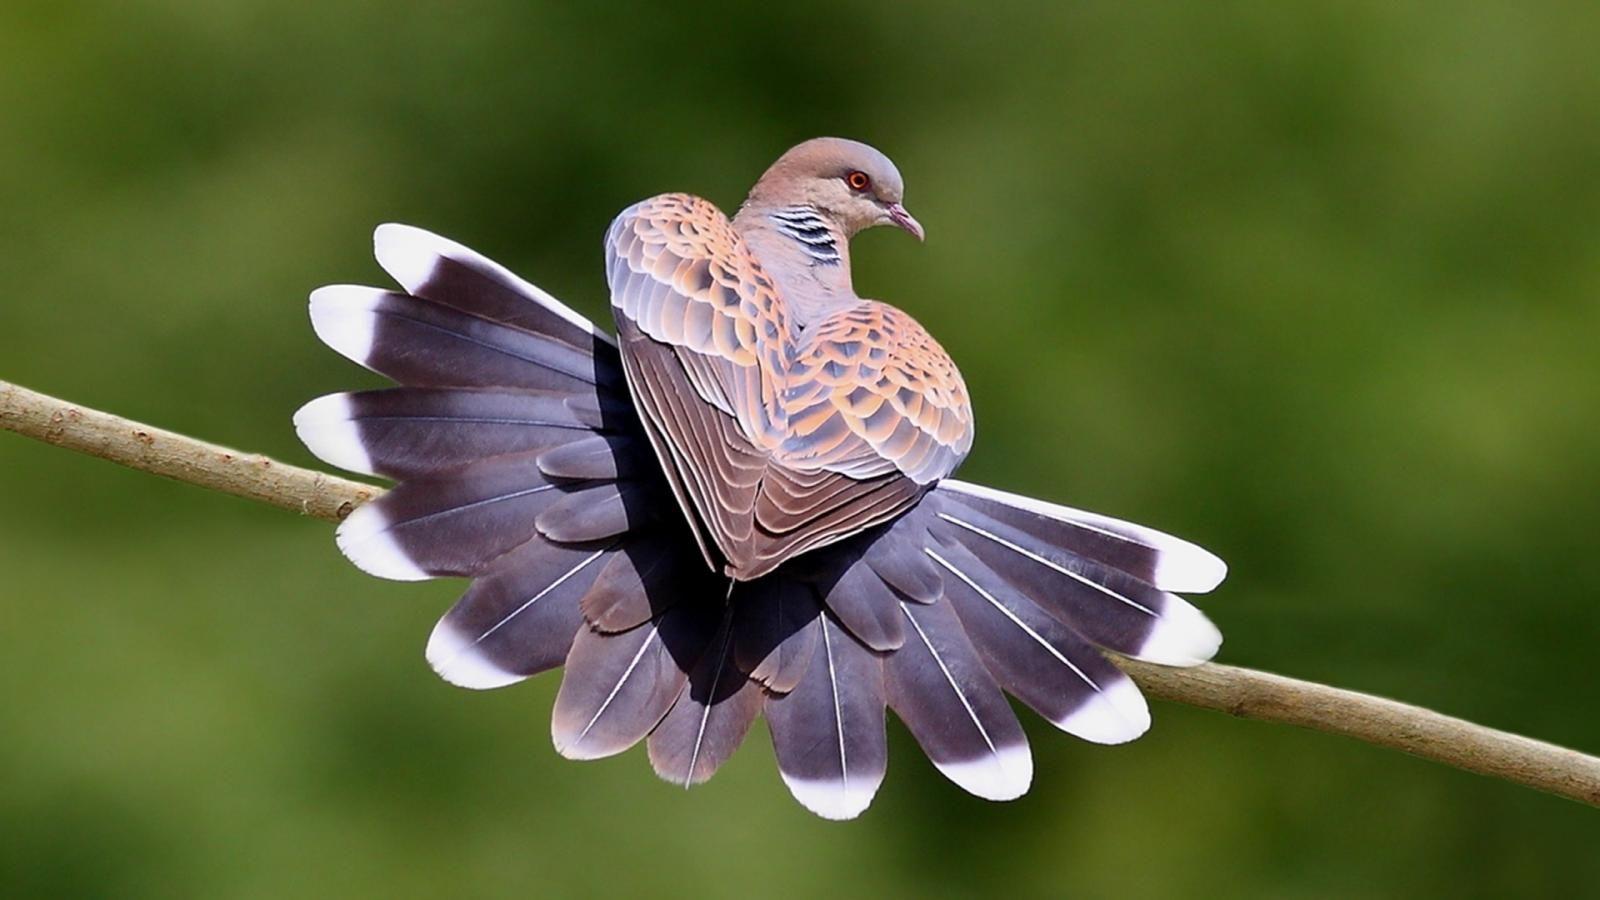 Beautiful Birds in Nature Wallpapers Birds HD Images